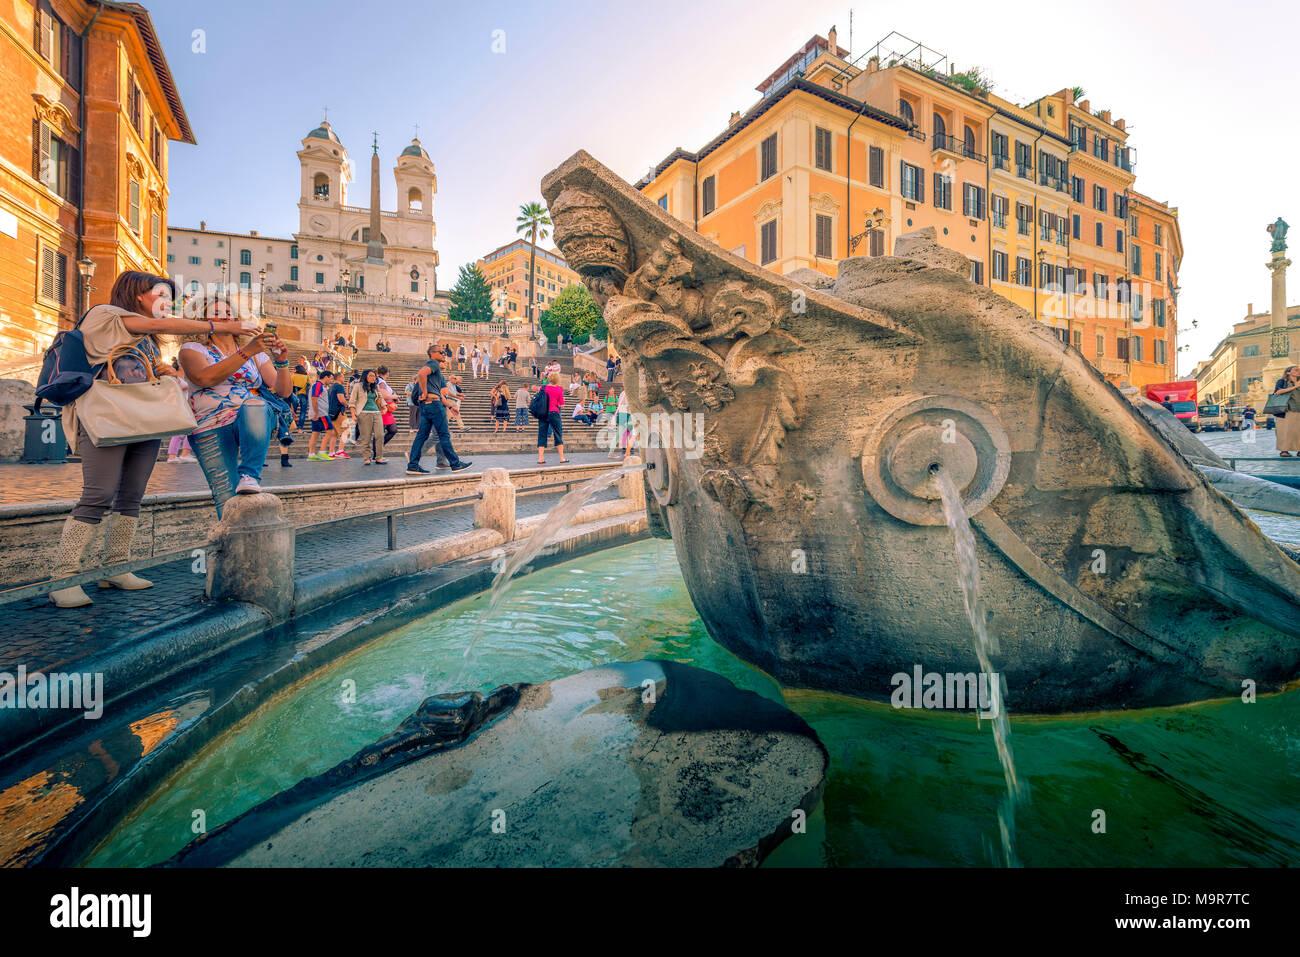 Europa, Italien, Rom, Spanische Treppe, Kirche,Trinita dei Monti - Stock Image